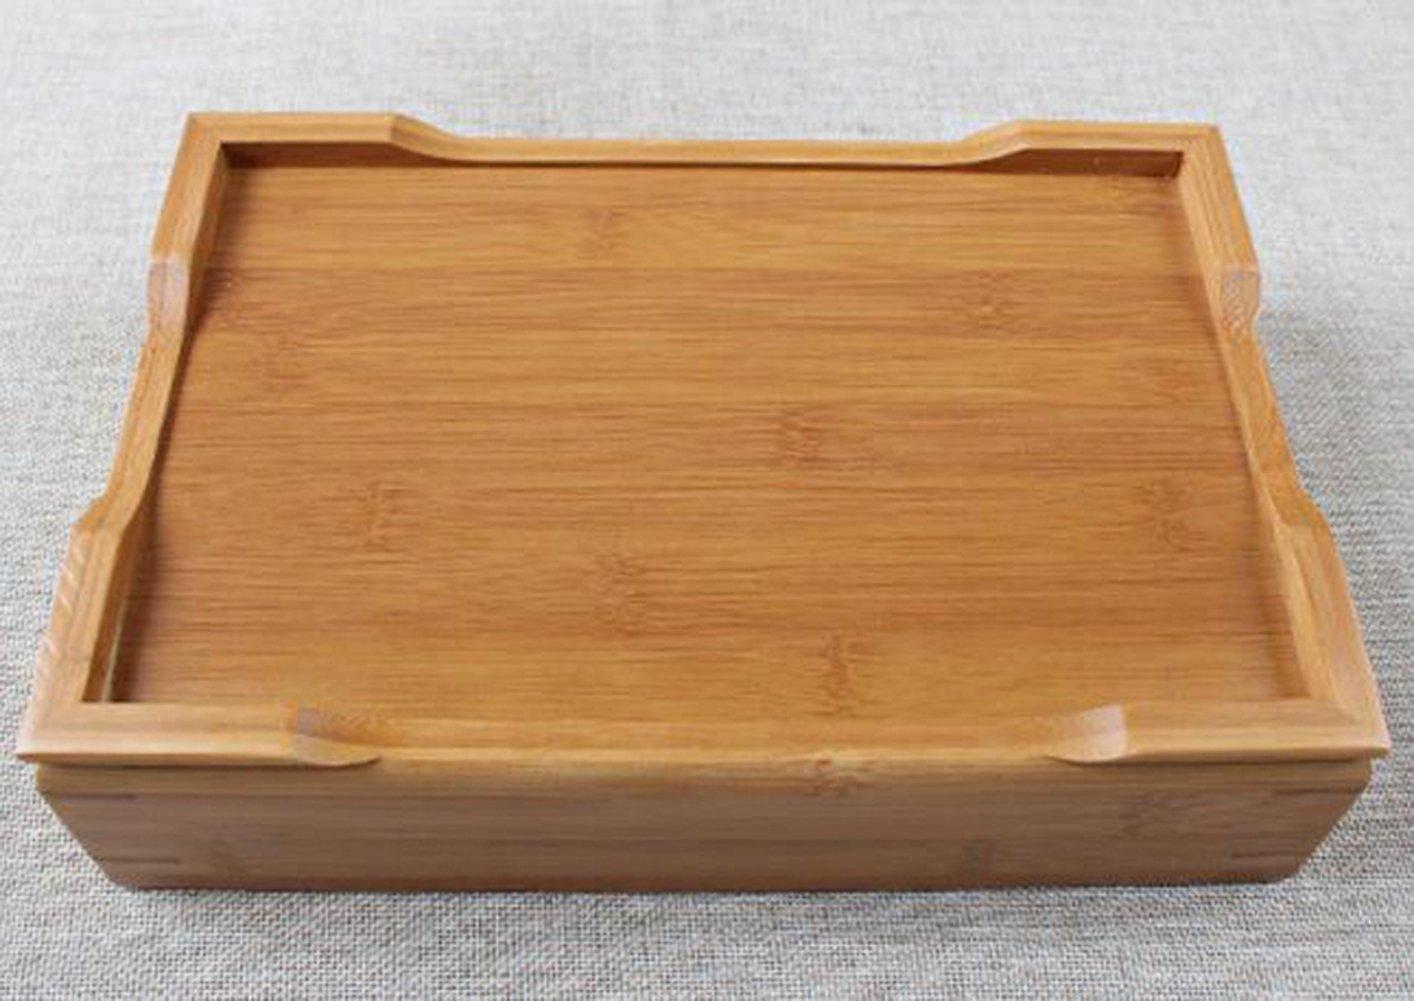 Hoobar Reservoir Type Bamboo Tea Tray - Chinese Kungfu Tea Table Serving Tray Box for Kungfu Tea Set by JKCOM (Image #6)